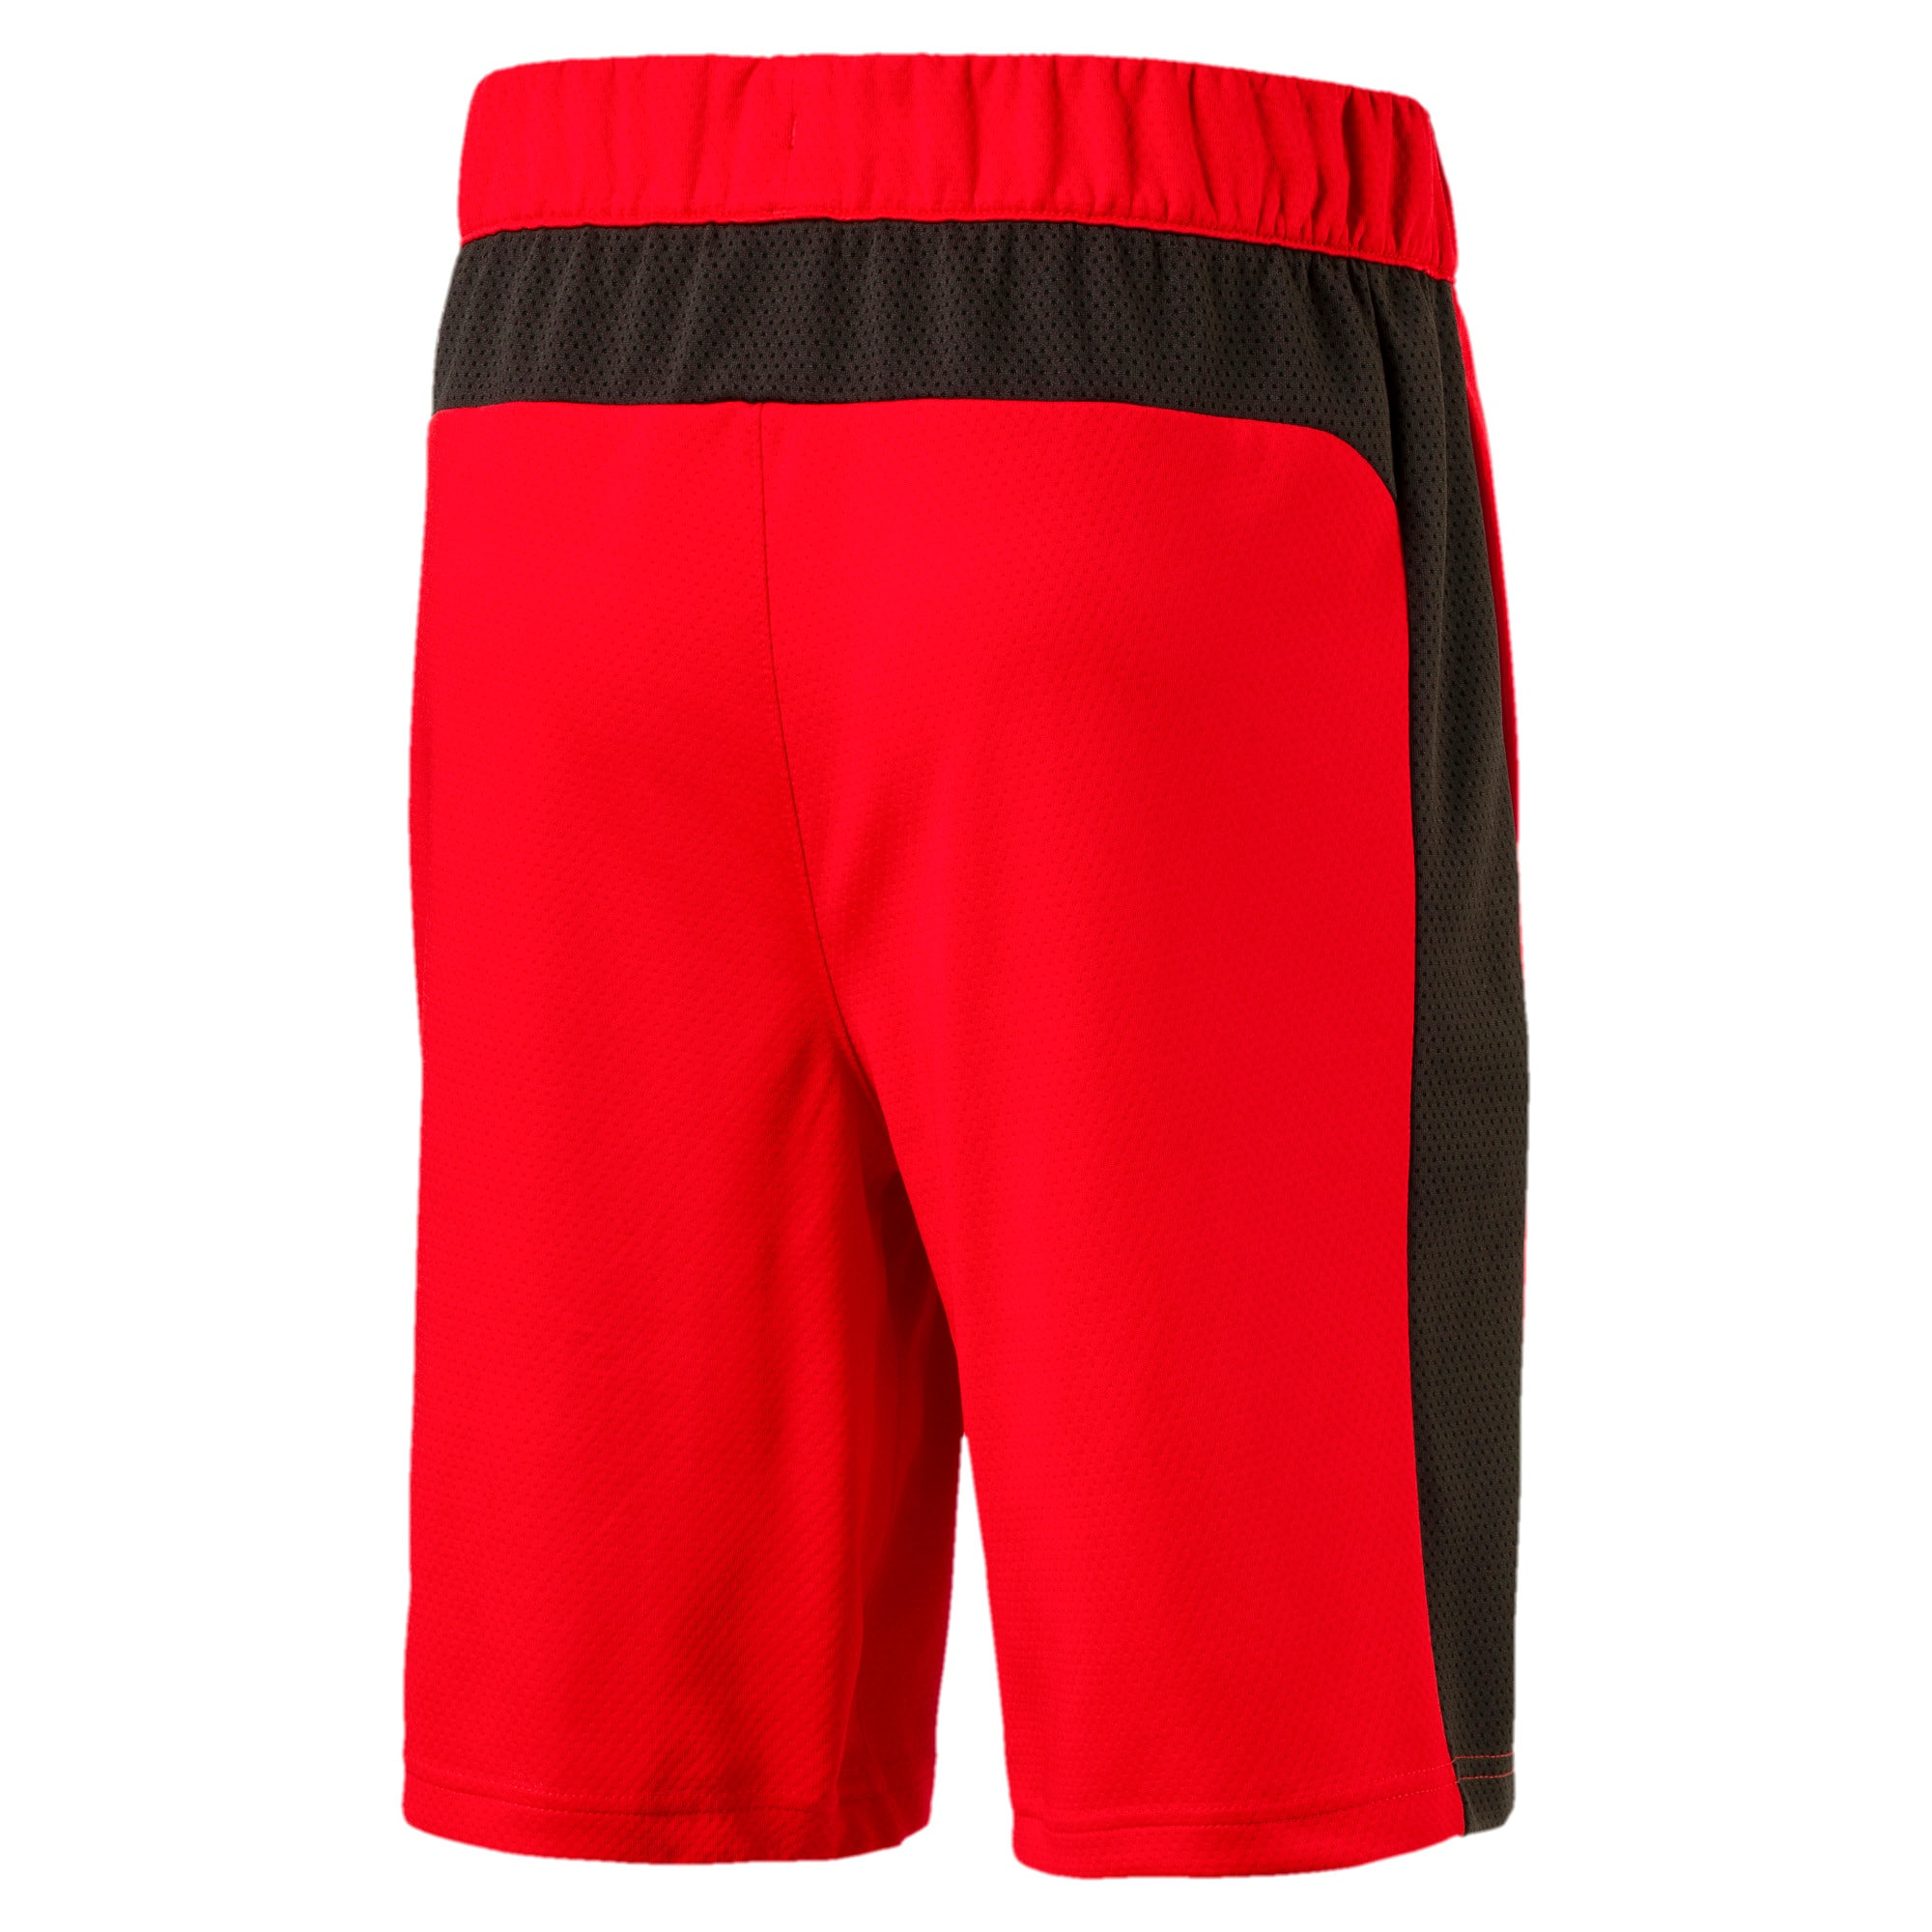 Thumbnail 2 of Boys' Gym Shorts, Flame Scarlet, medium-IND